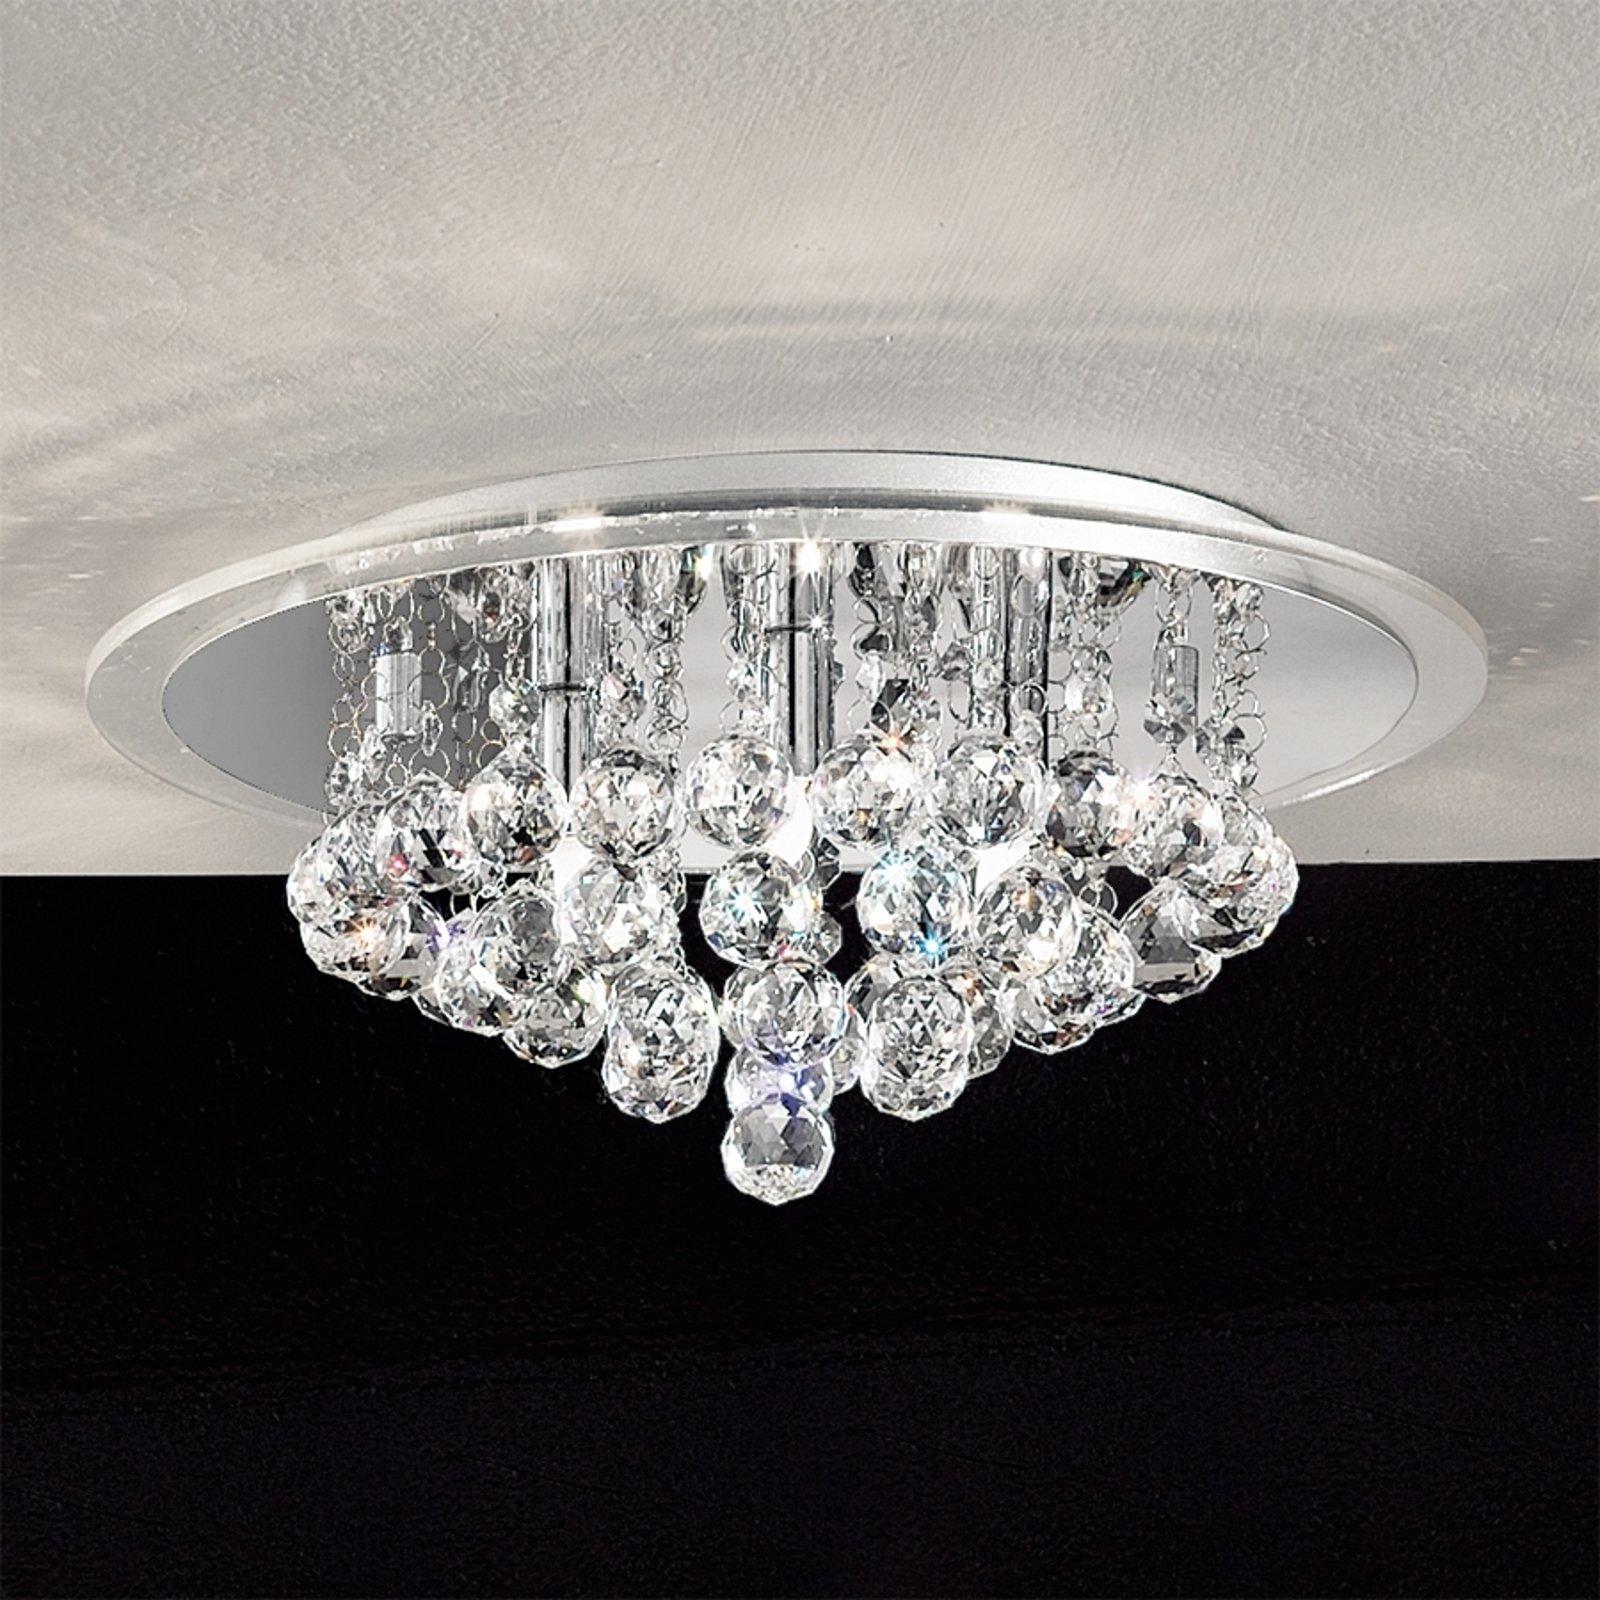 Strålende DESPINA taklampe 38 cm